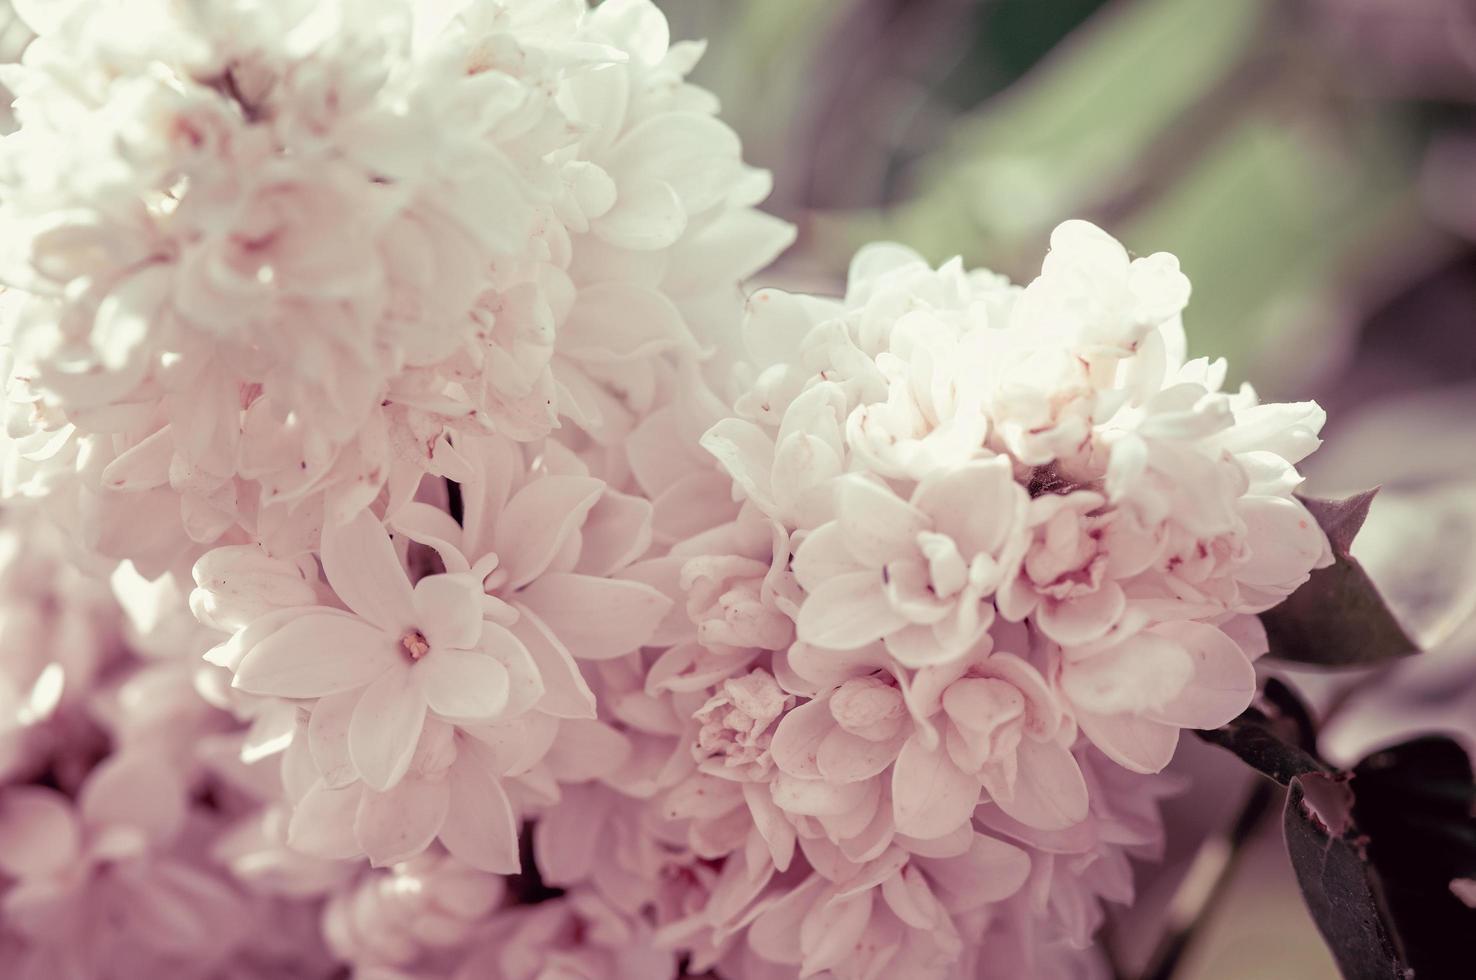 branche de fleurs lilas blanc photo